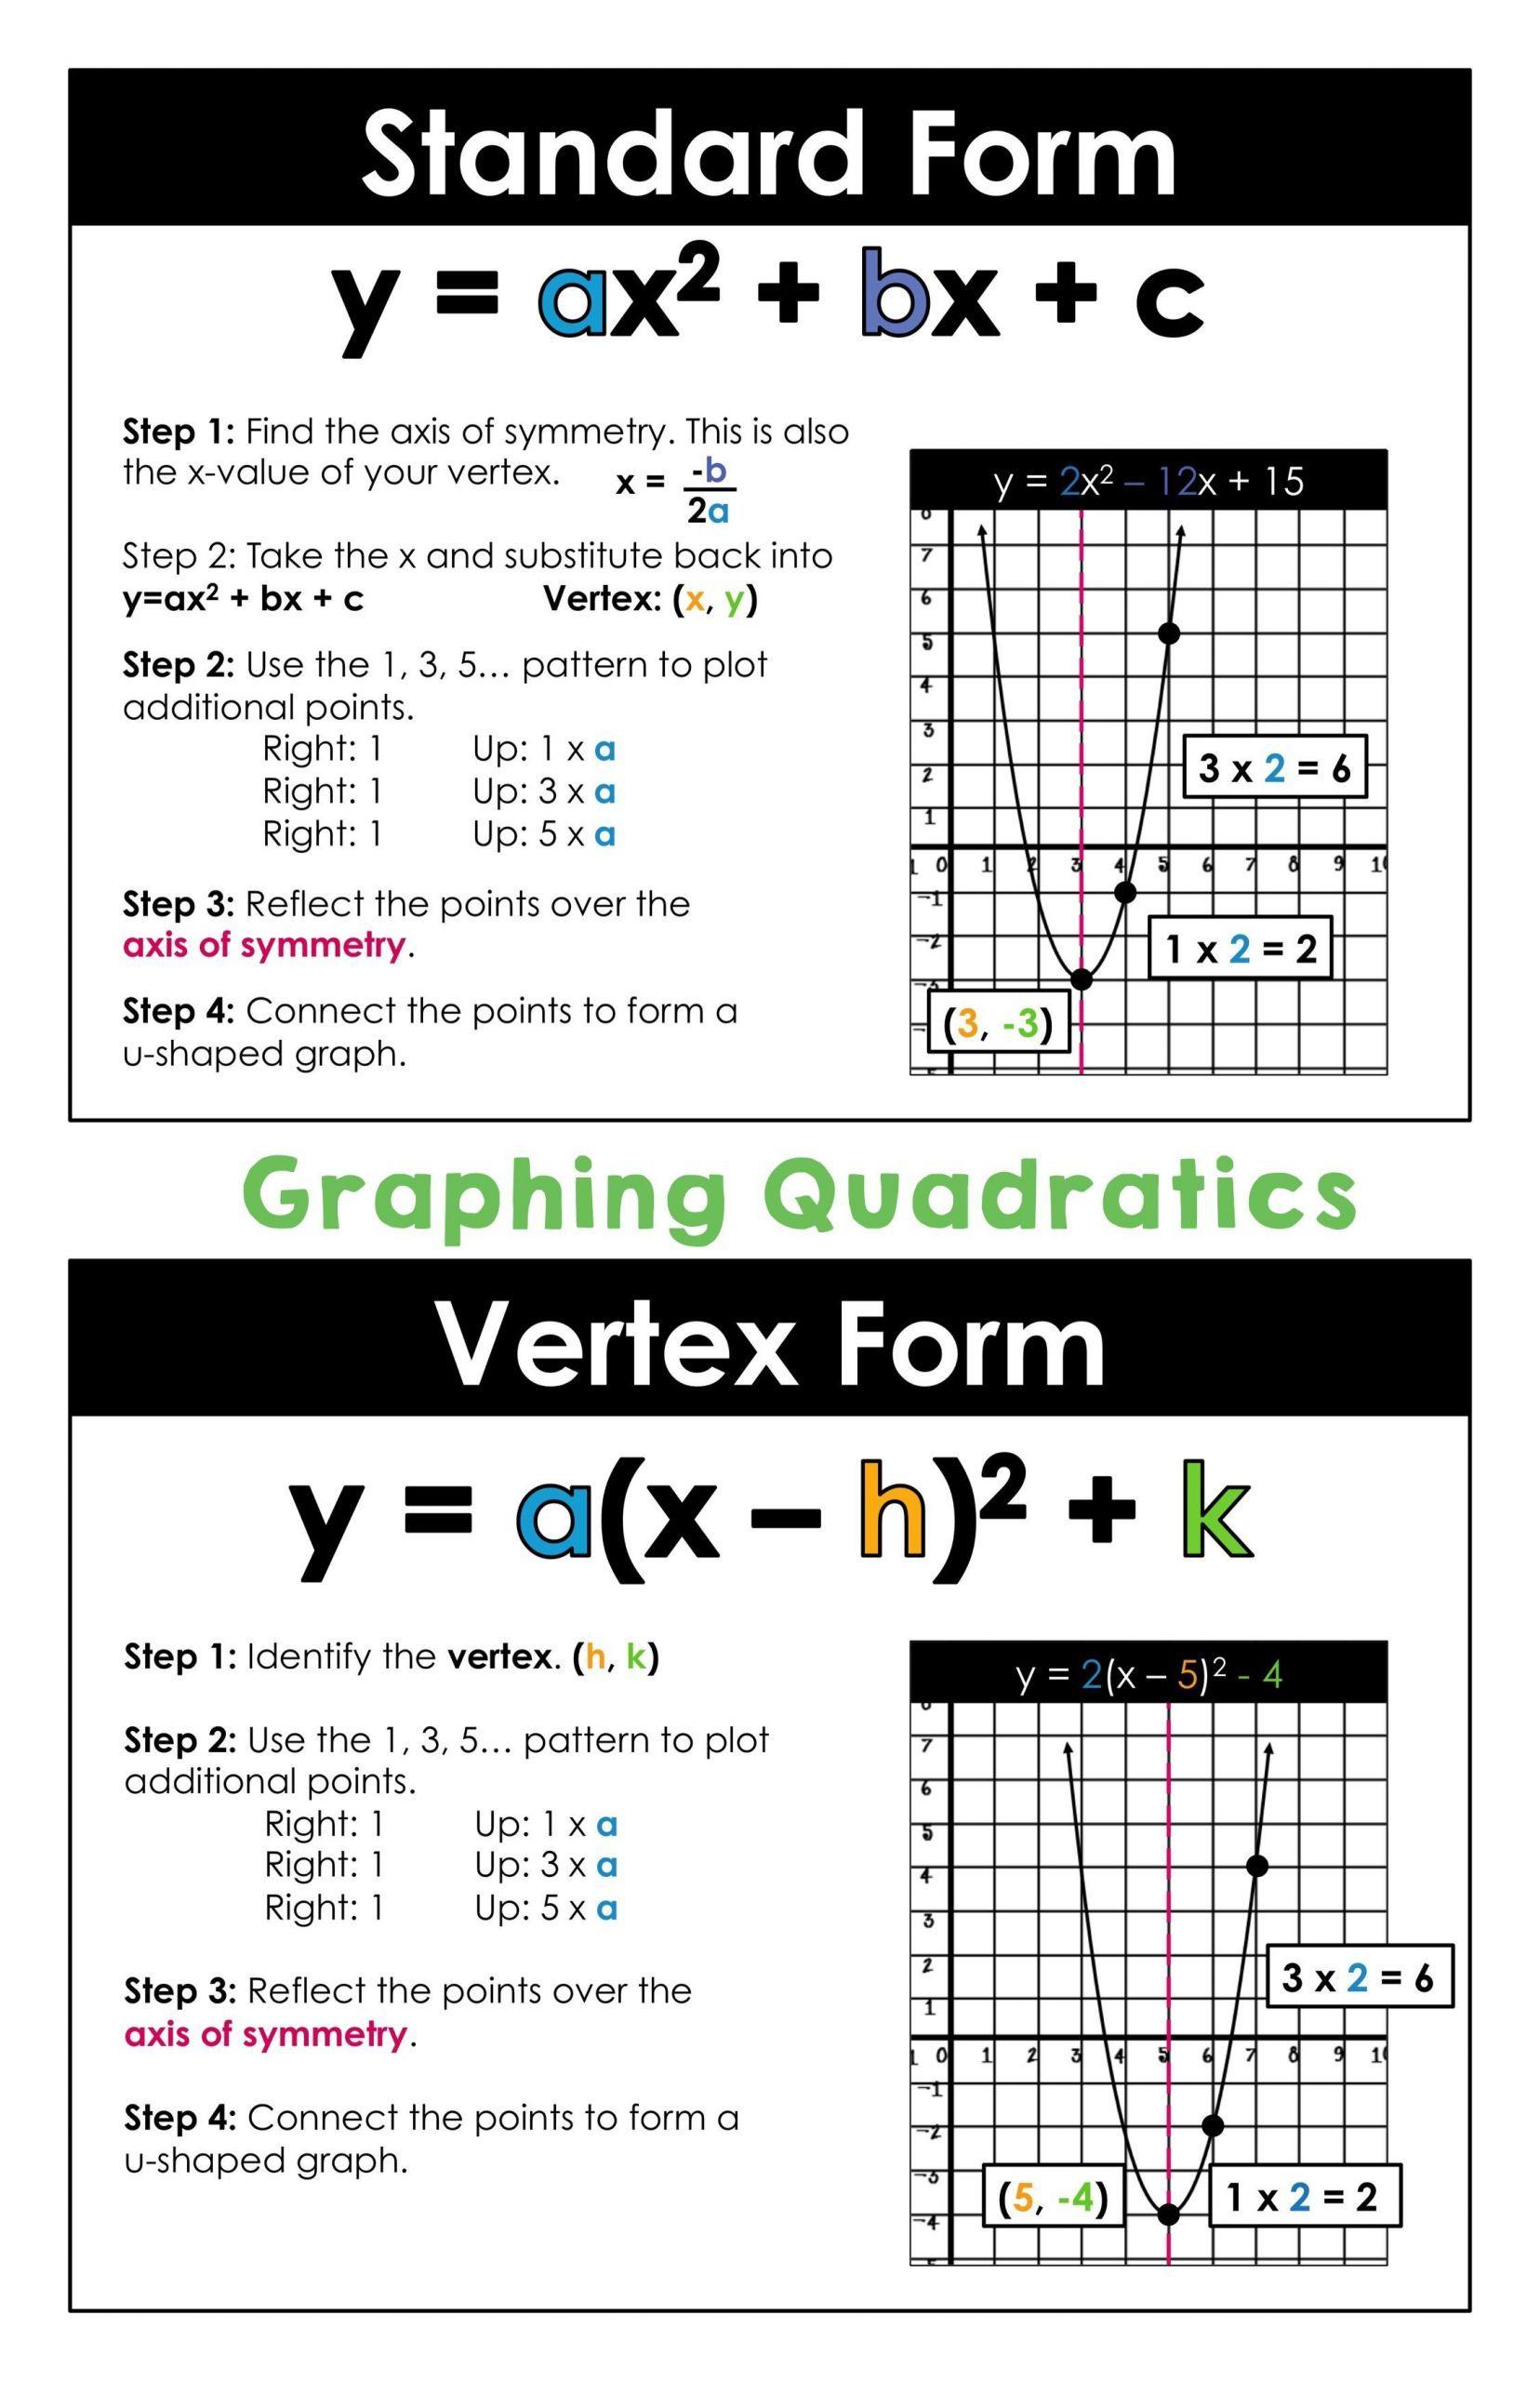 11 Graphing Quadratic Functions Worksheet Answers Algebra